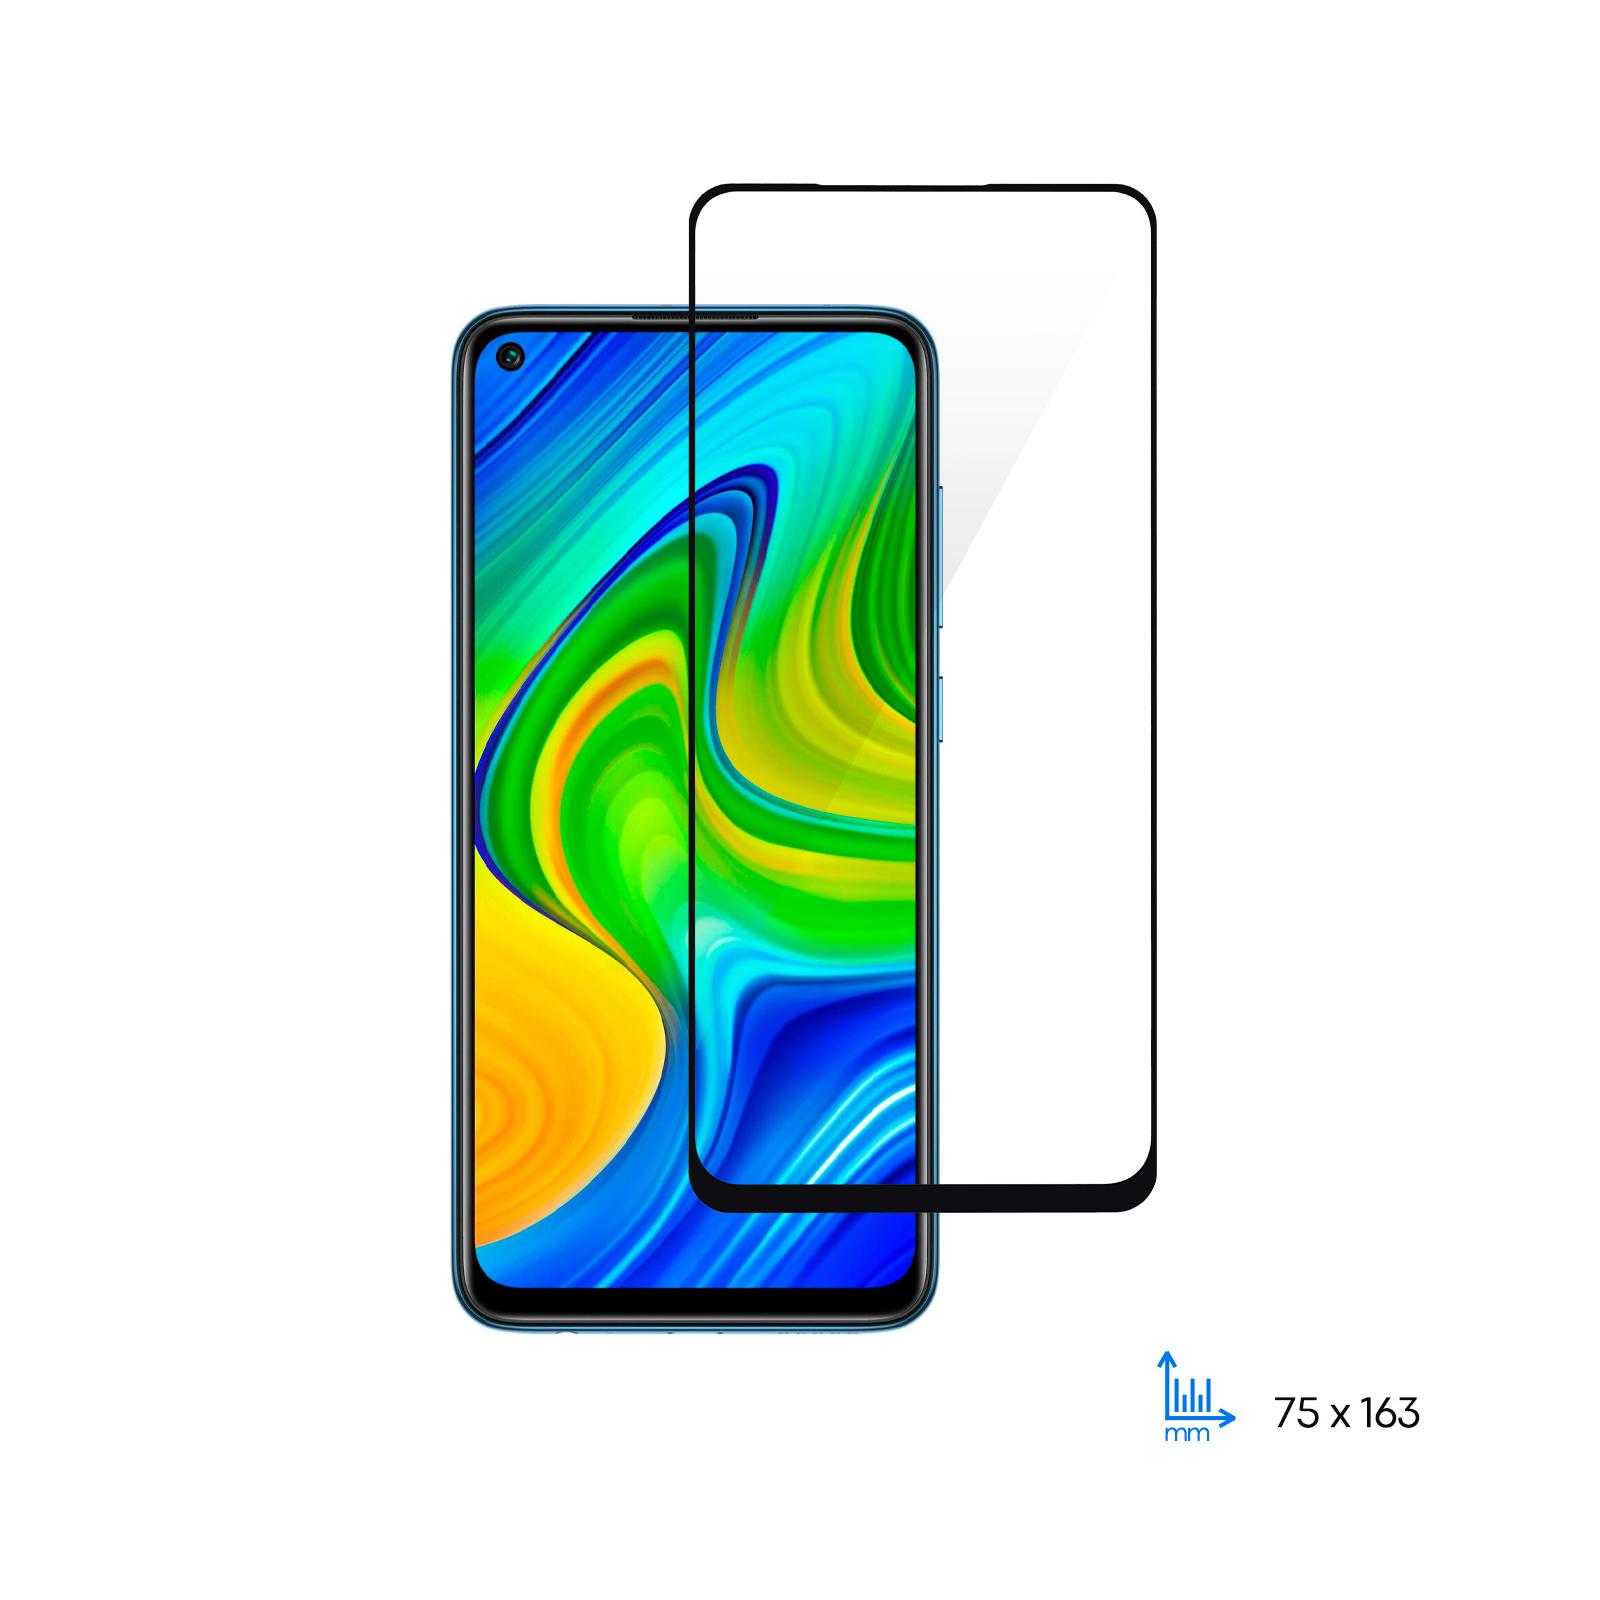 Скло захисне 2E Basic Xiaomi Redmi Note 9, 2.5D FCFG, black border (2E-MI-N9-SMFCFG-BB)